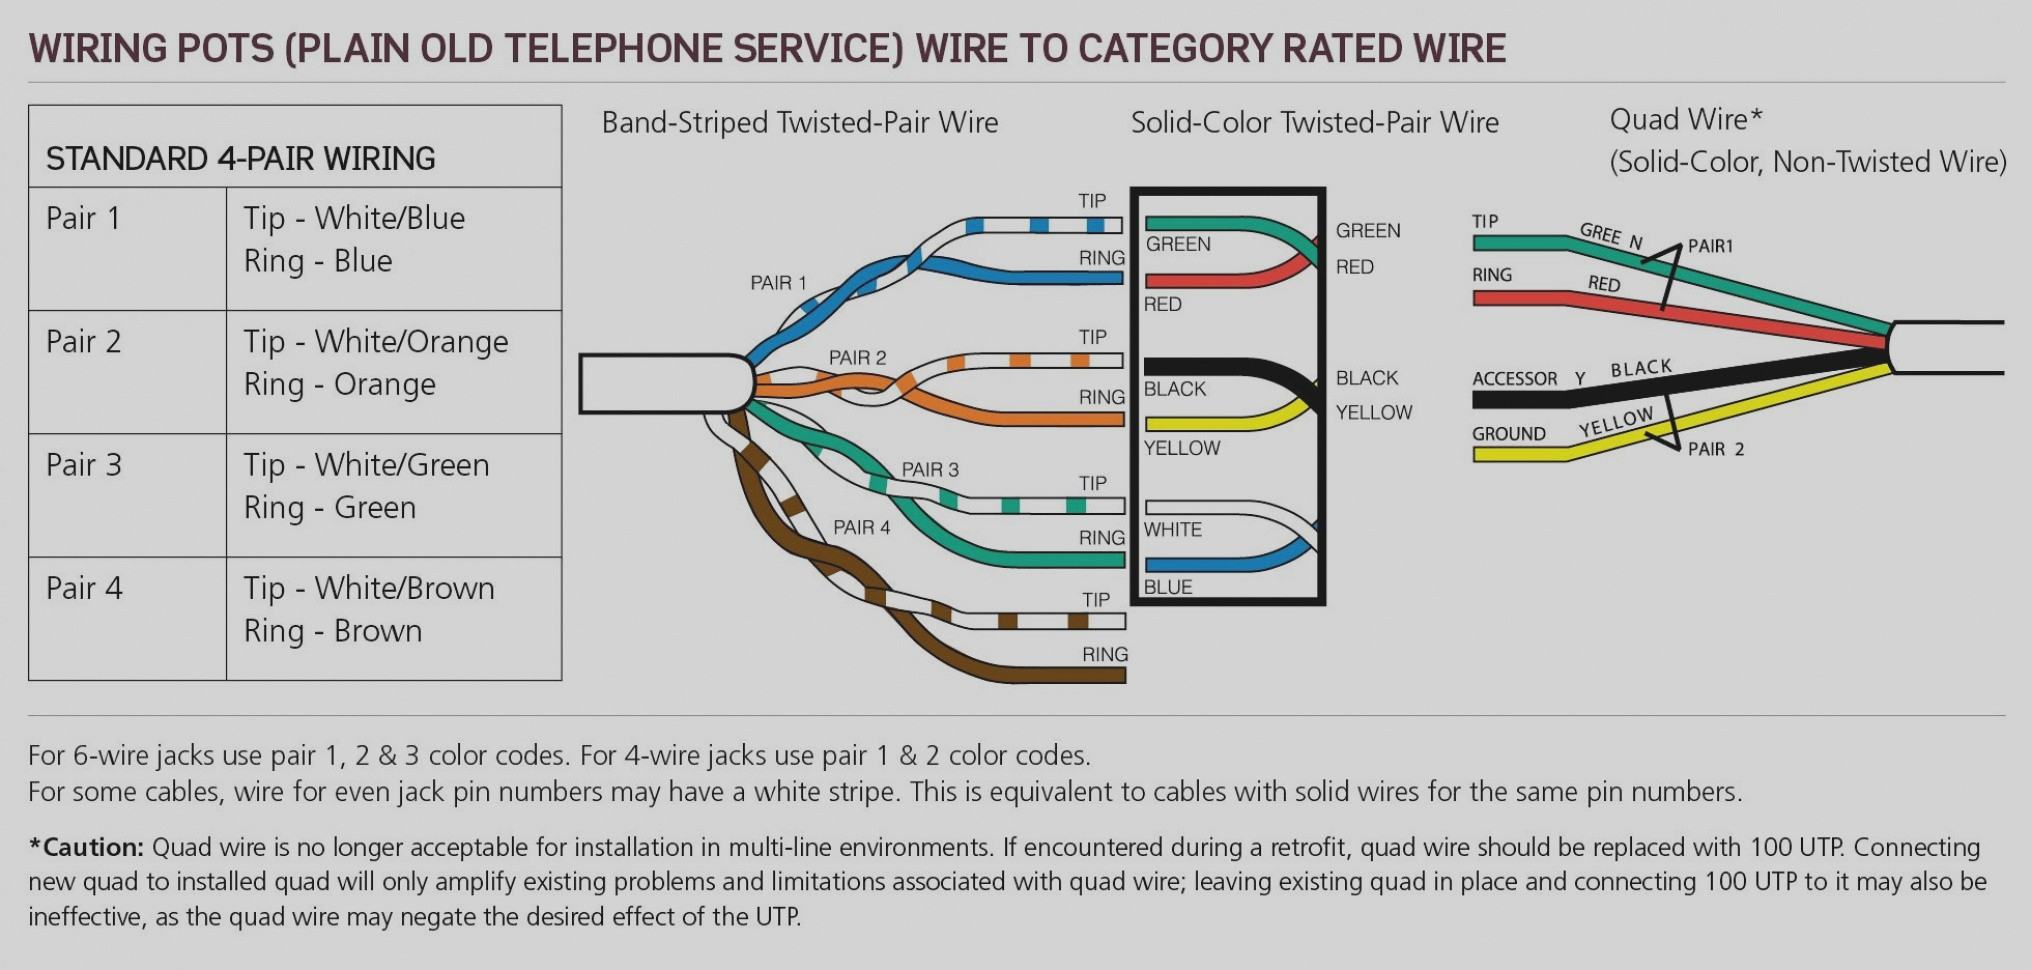 Dsl Wiring Requirements - Wiring Diagram Data Oreo - Phone Wiring Diagram